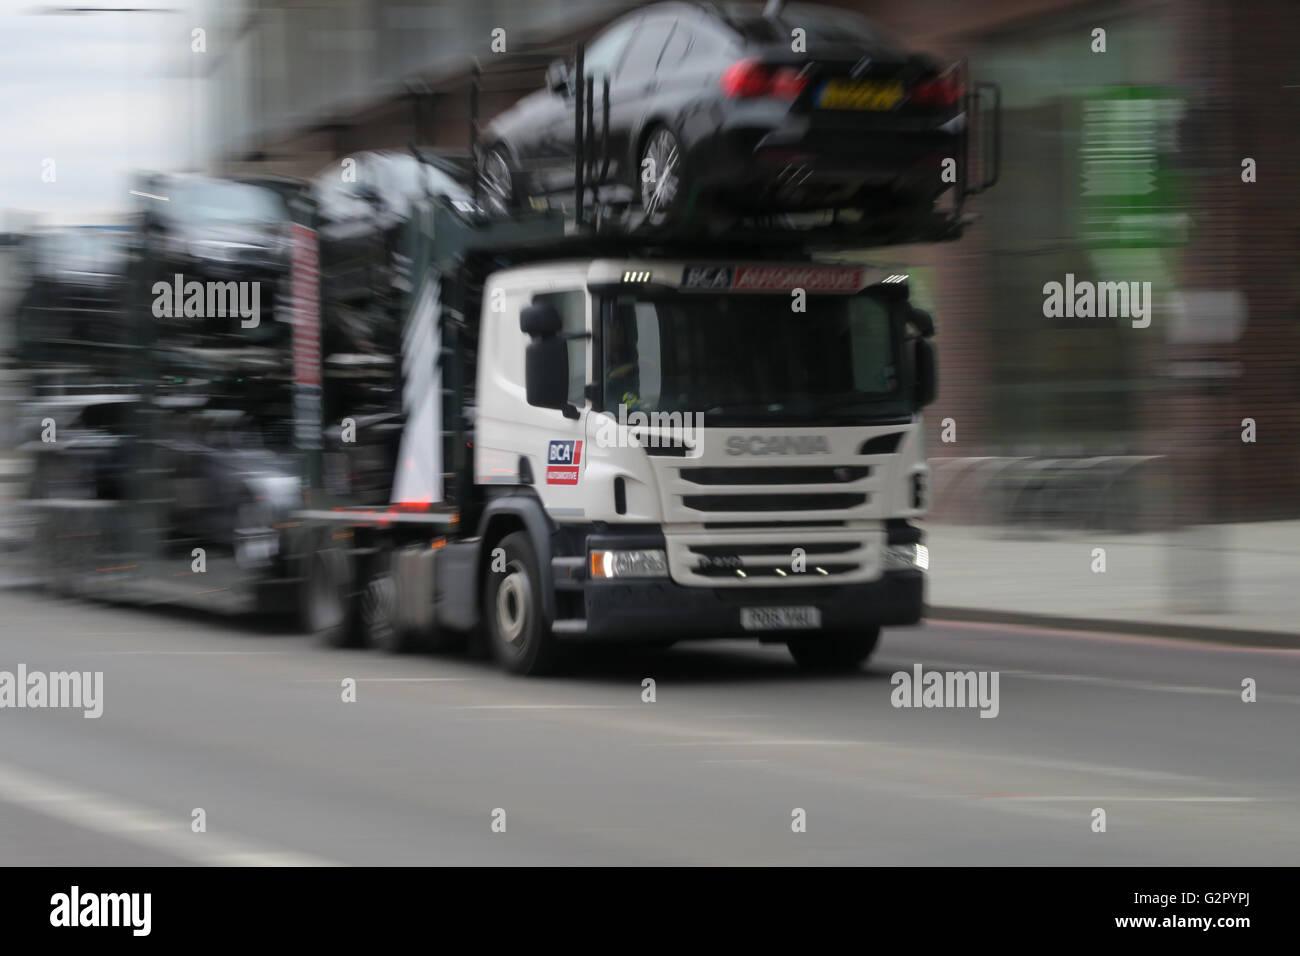 Scania car transporter HGV in Vauxhall, London, United Kingdom - Stock Image